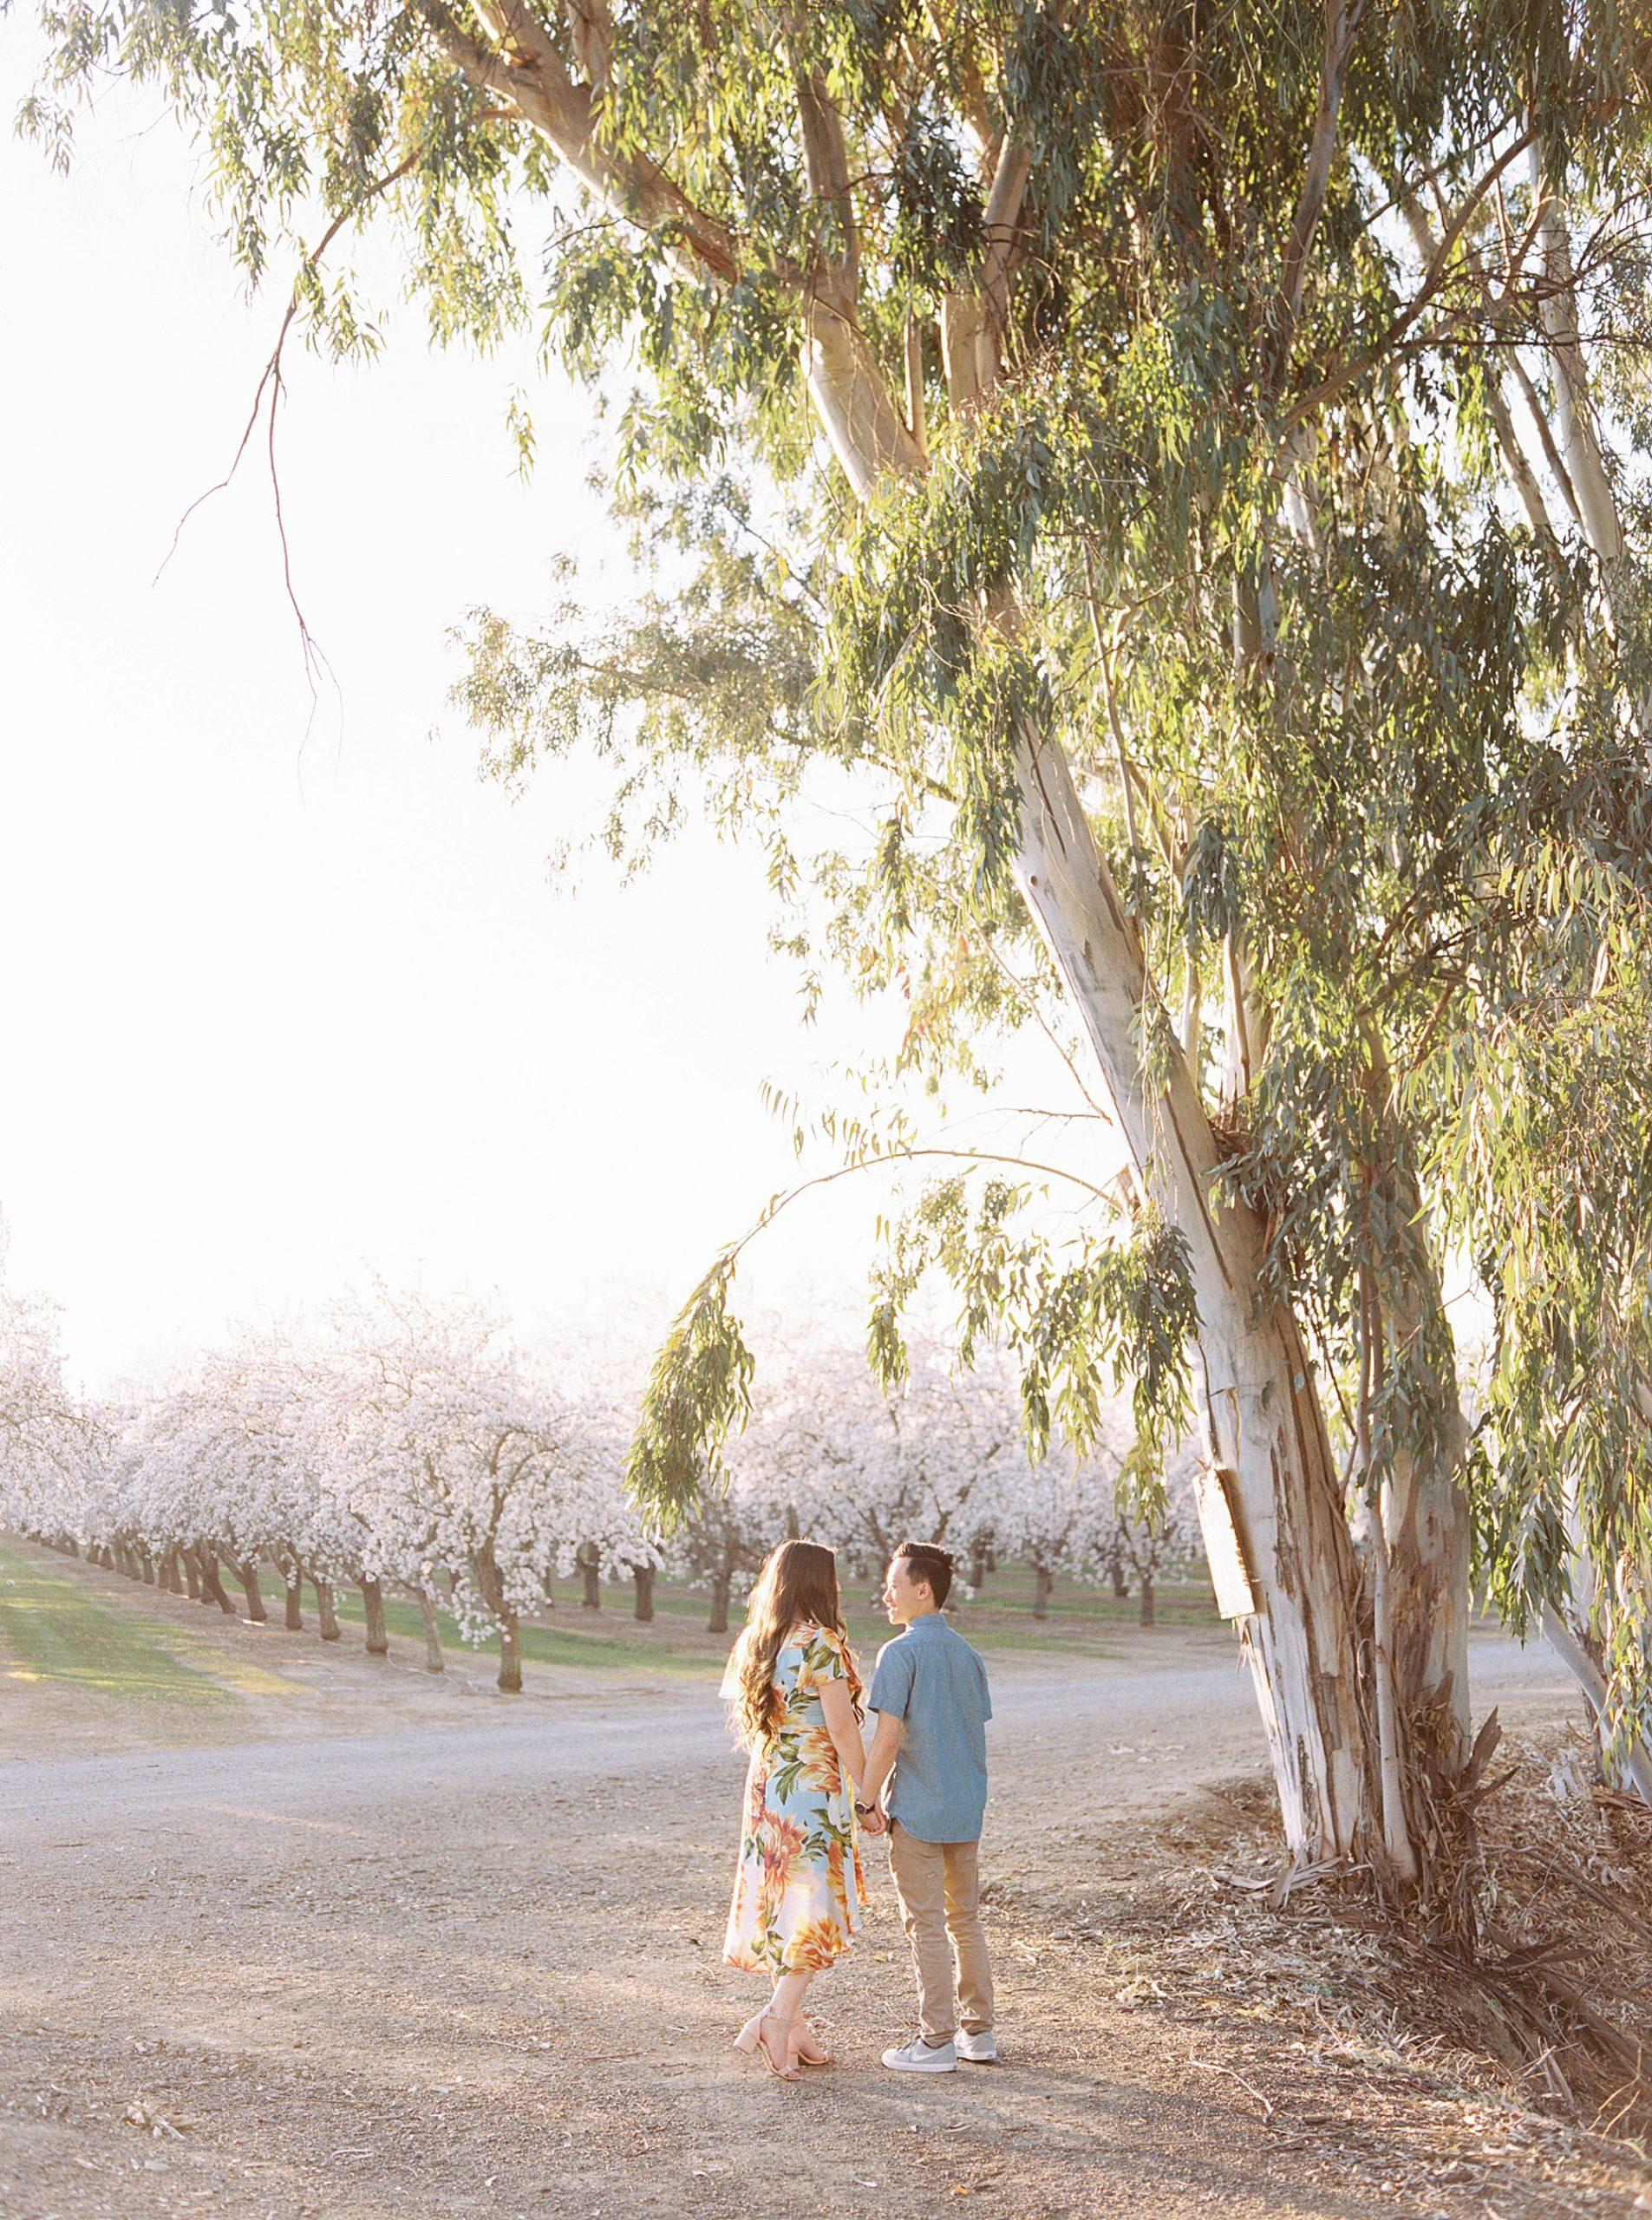 Almond Orchard Engagement Session - Caley and Tyler - Lone Oak Wedding - Ashley Baumgartner - Almond Blossom_0018.jpg